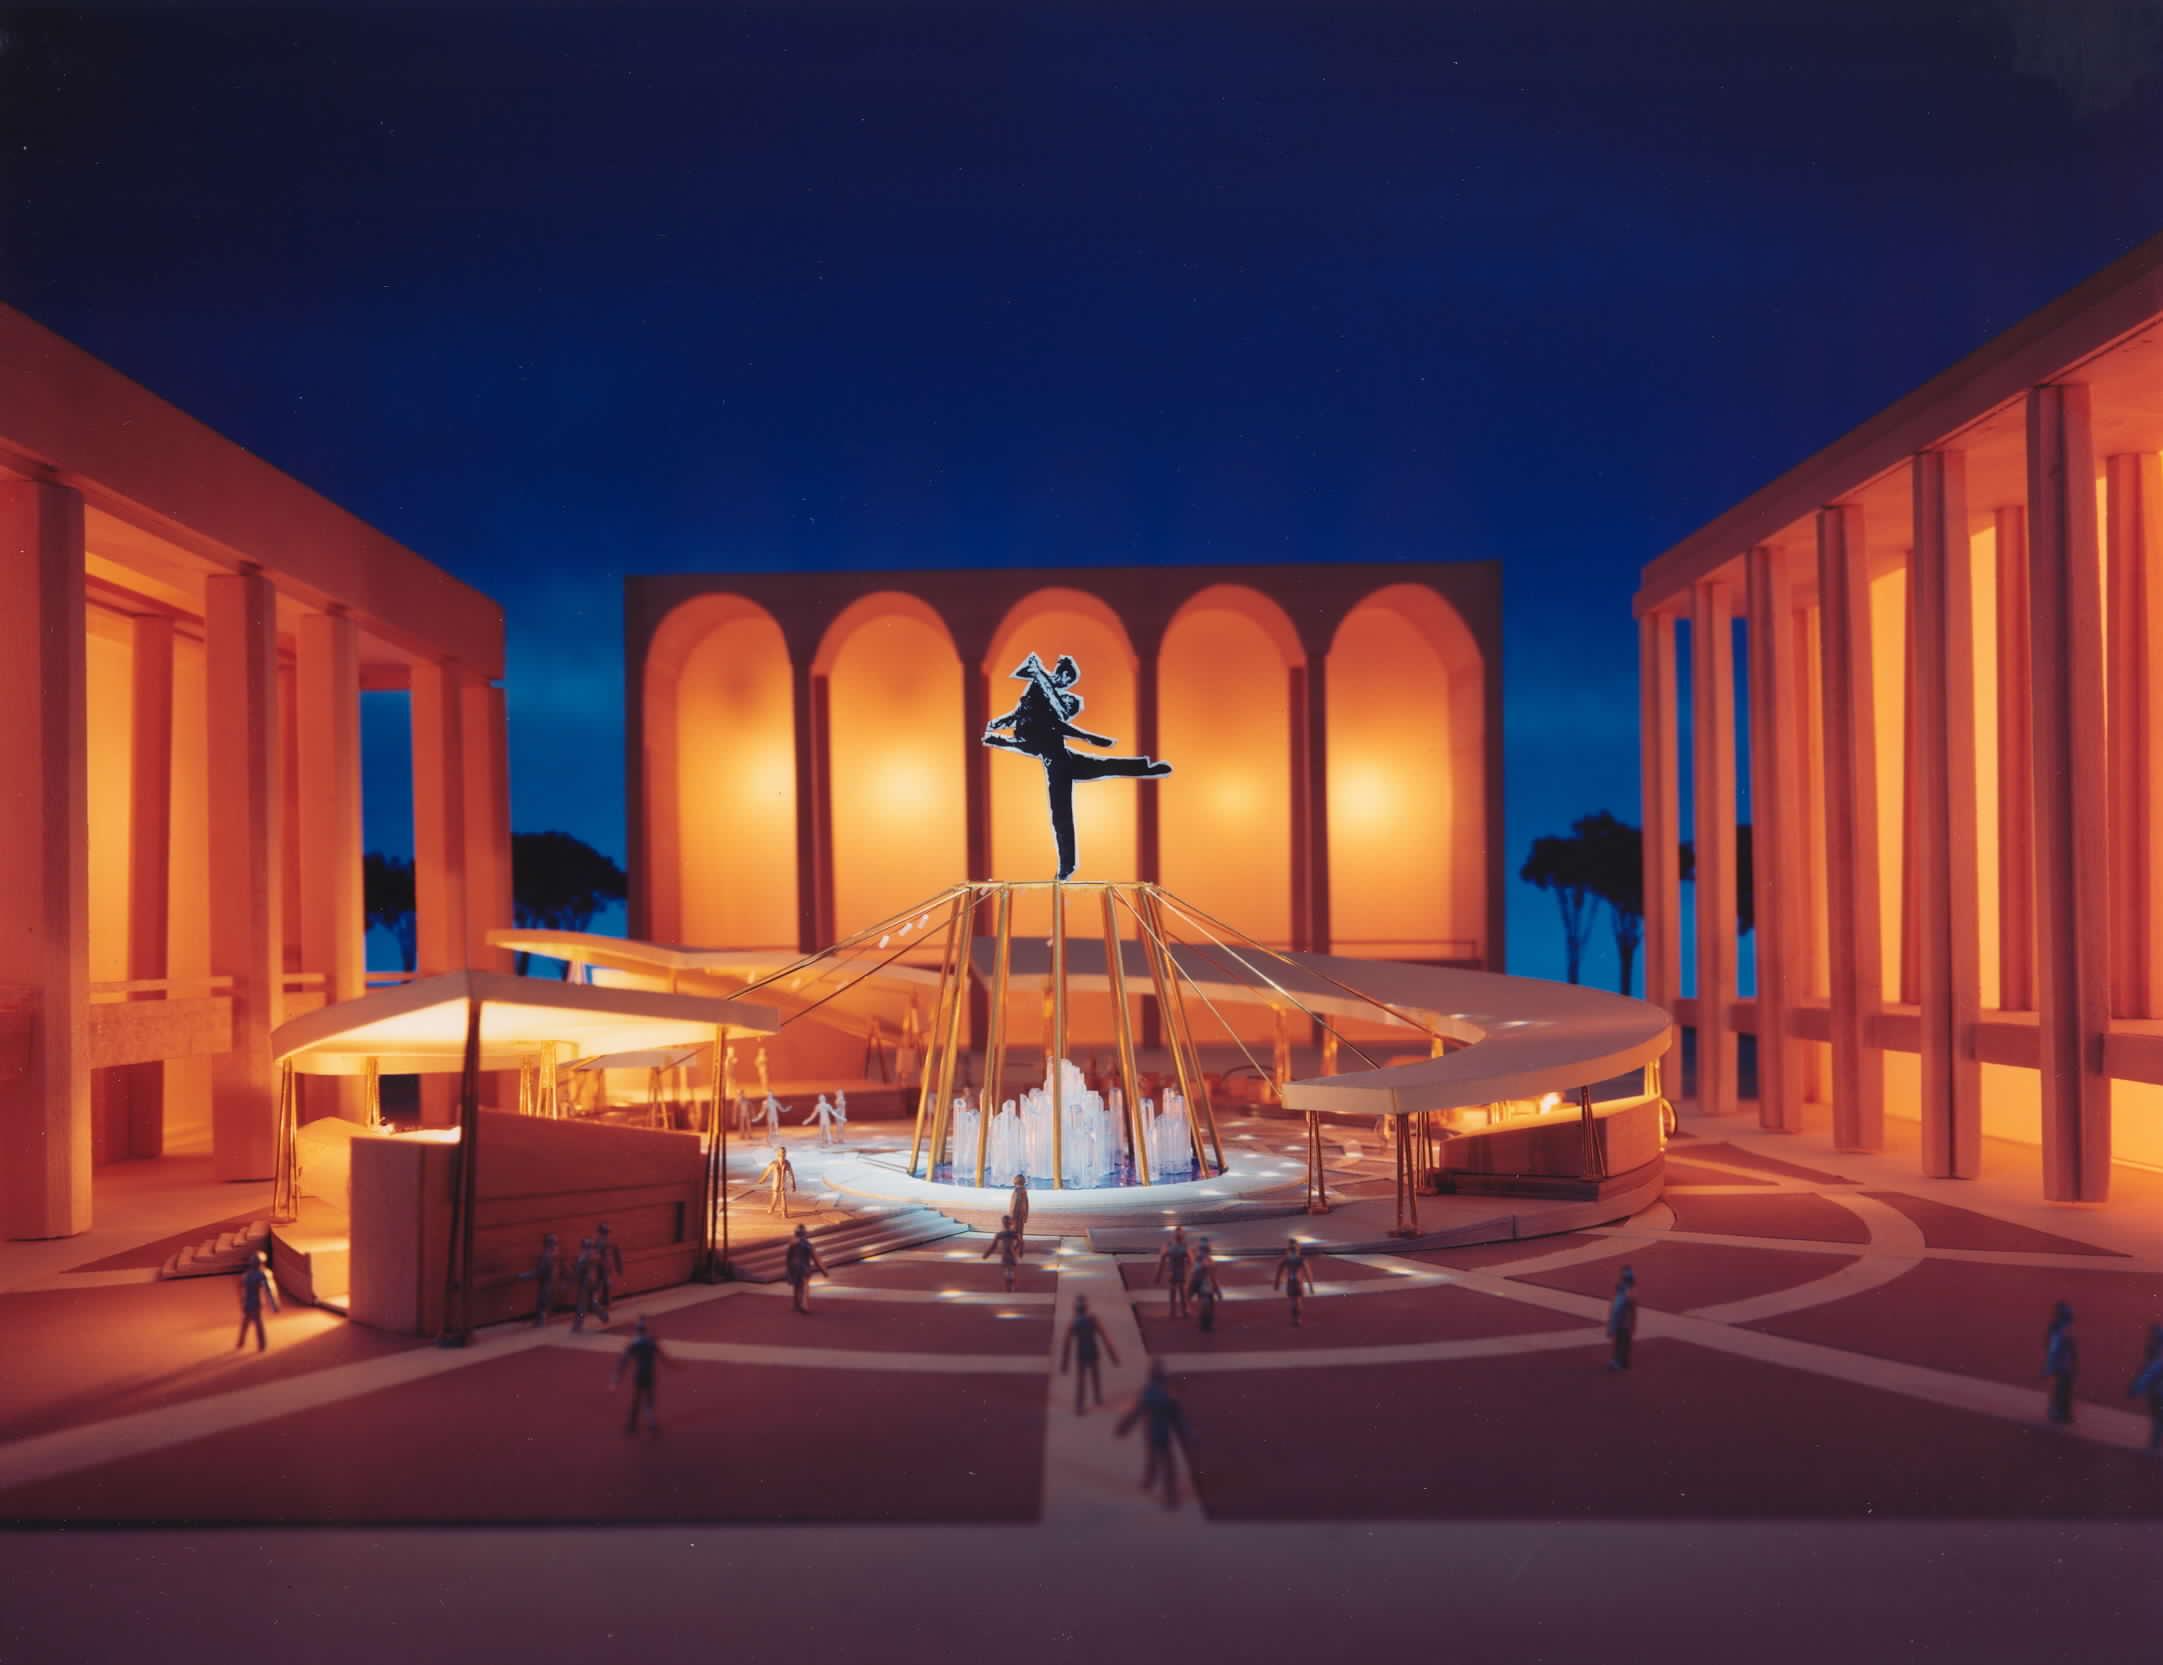 Lincoln-Center-Pavilions-Alan-Joslin-02.jpg